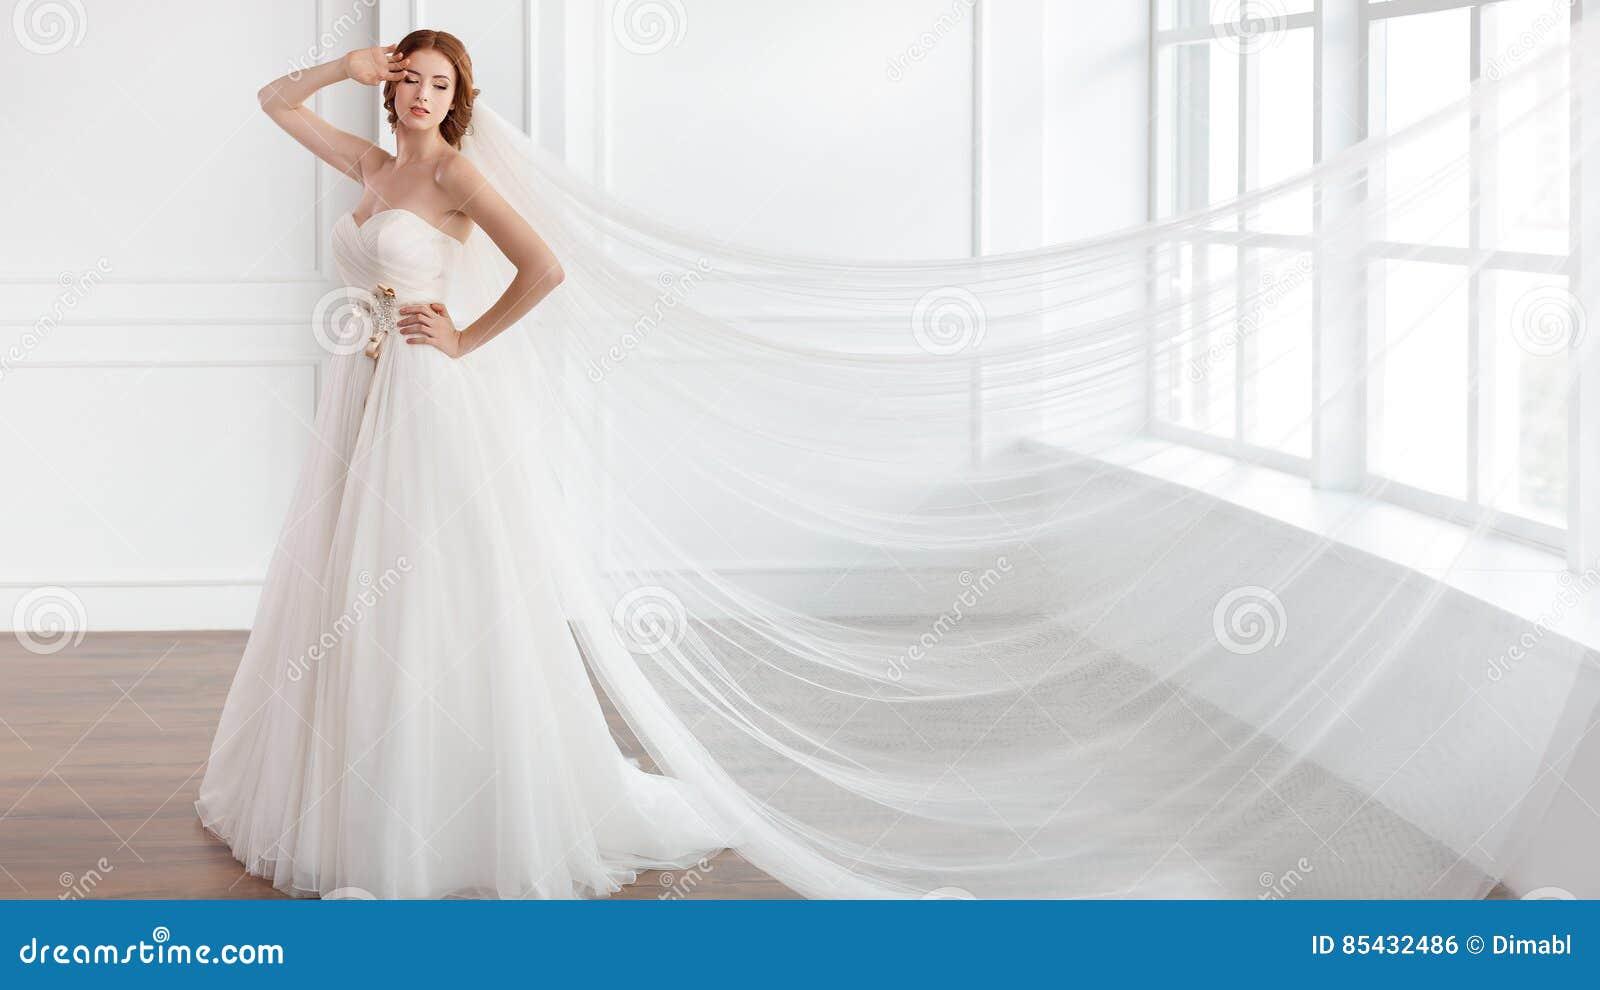 Big Long Train Luxury Real Photos Wedding Dresses Amanda Novias